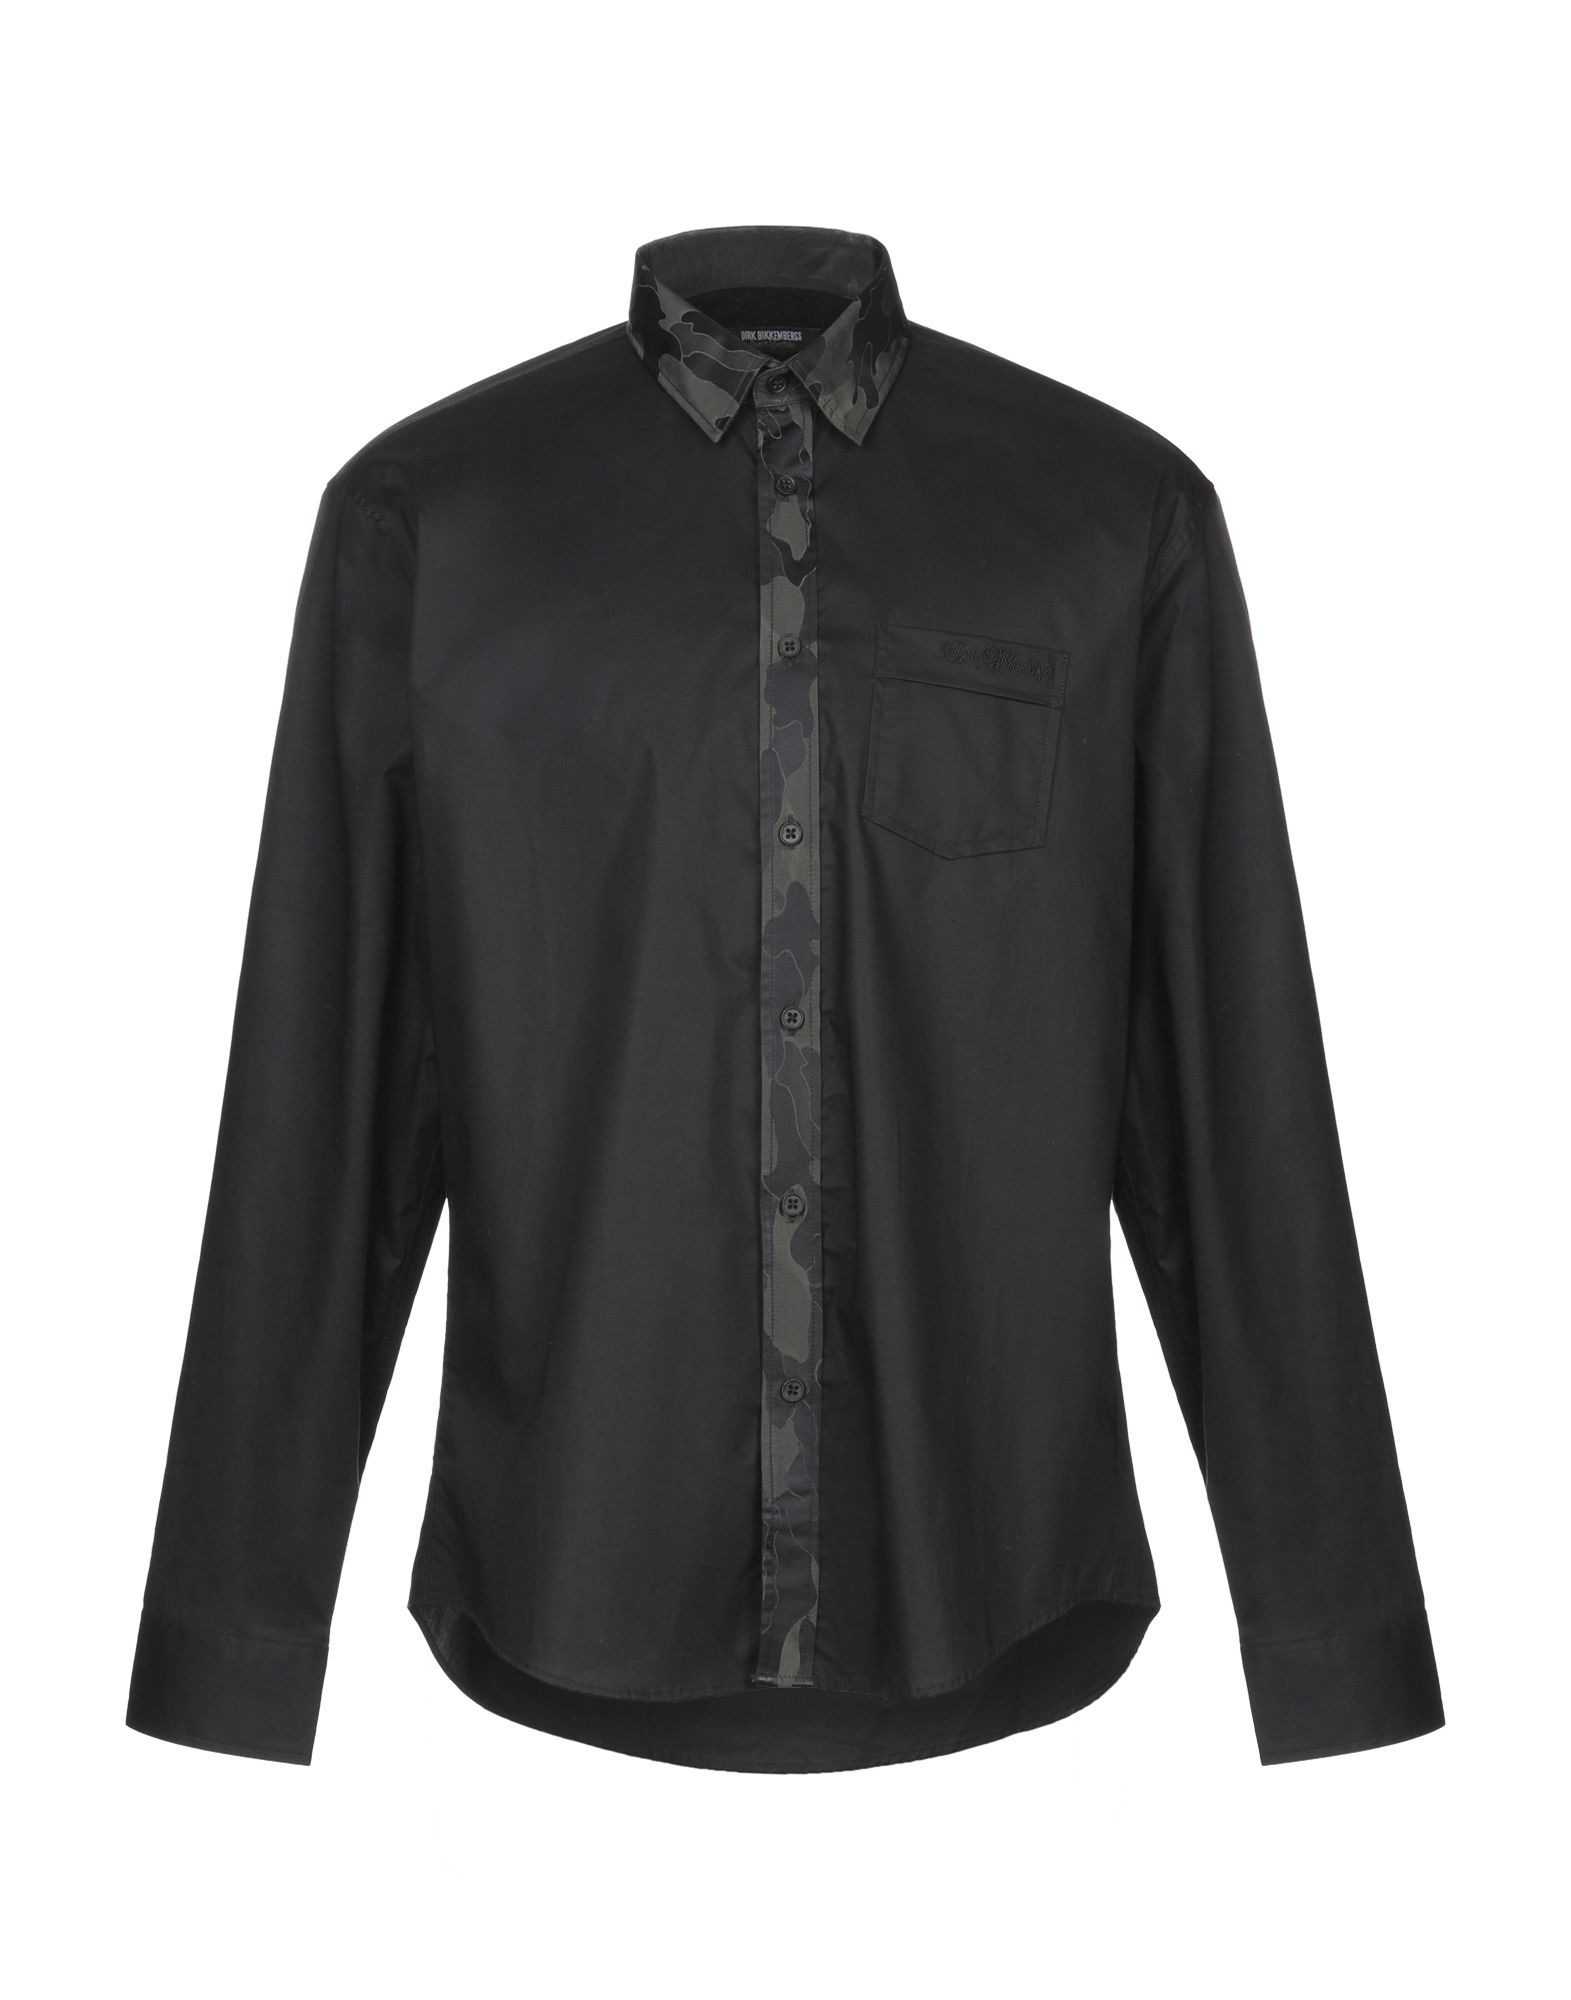 DIRK BIKKEMBERGS Pубашка цены онлайн